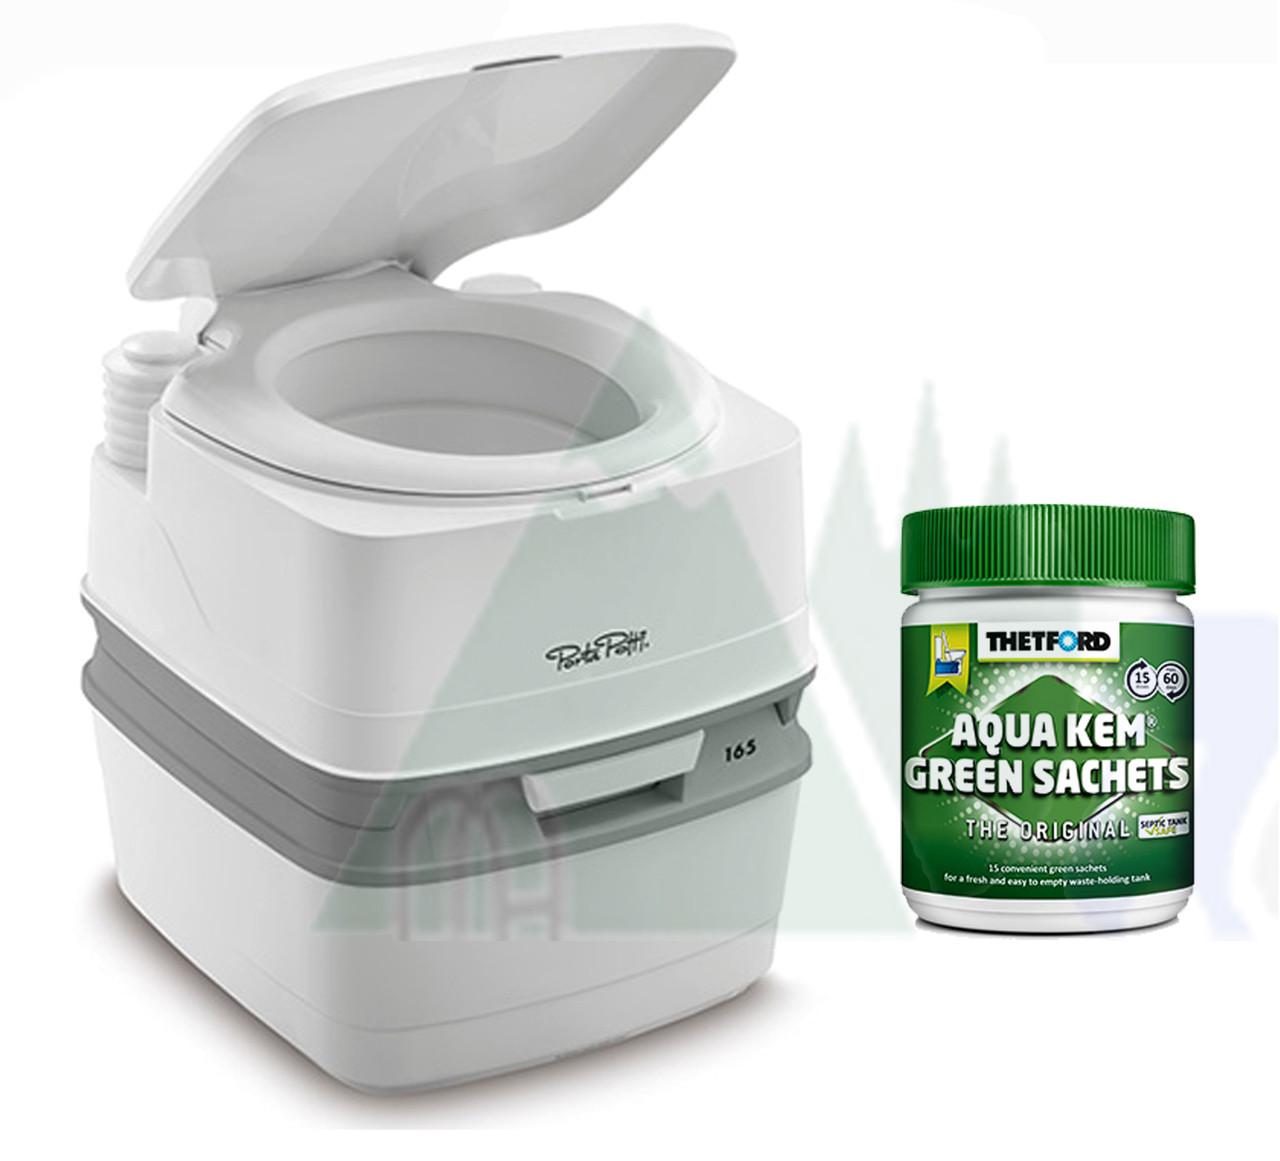 Thetford 165 portable toilet and Aqua Kem Green sachets